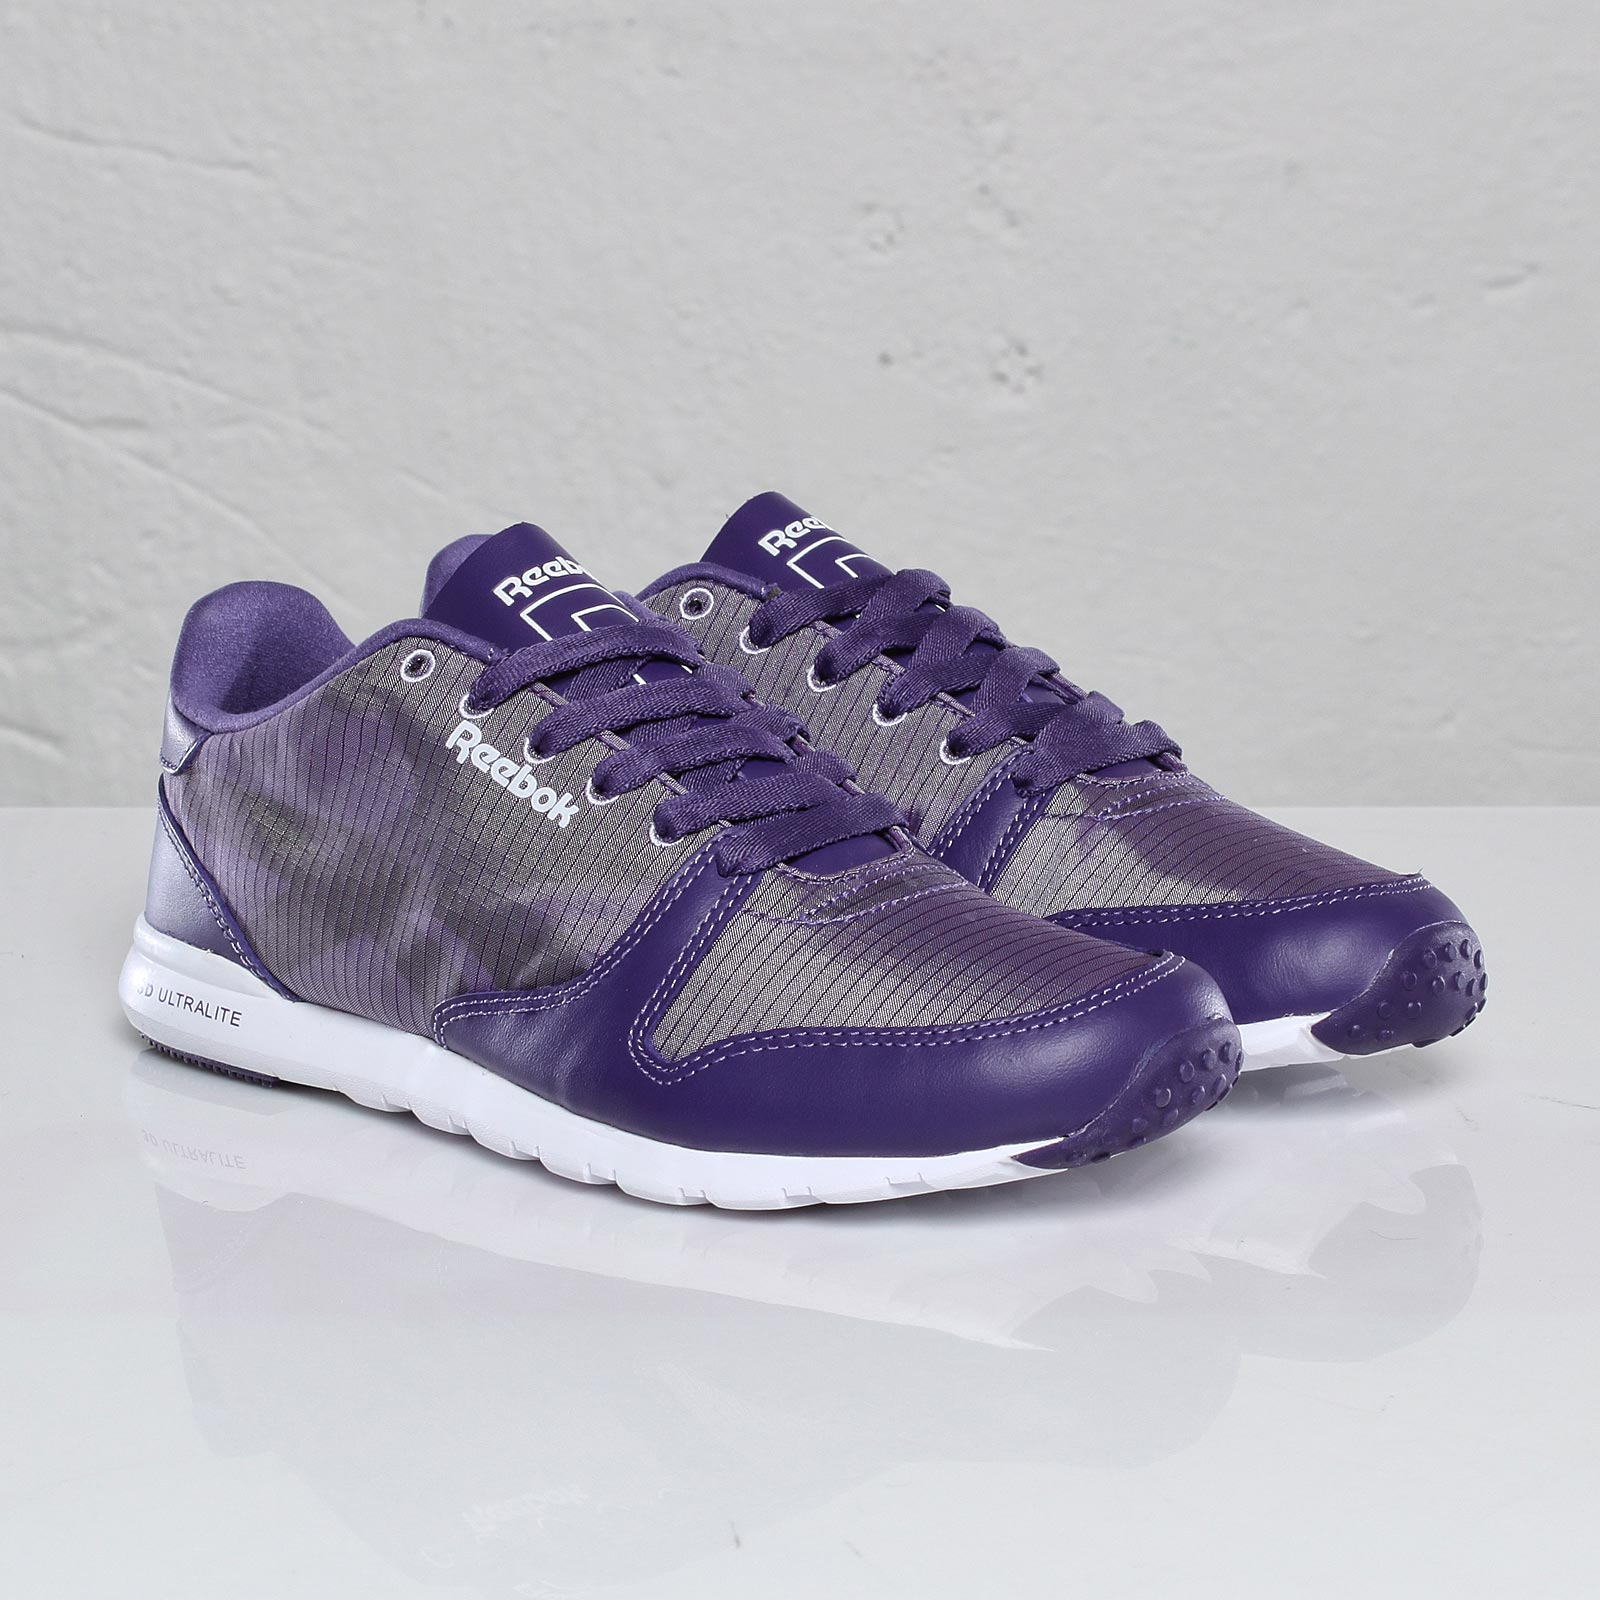 ac7e7d8c466 Reebok Classic Leather Ultralite Pkbl - 102102 - Sneakersnstuff ...